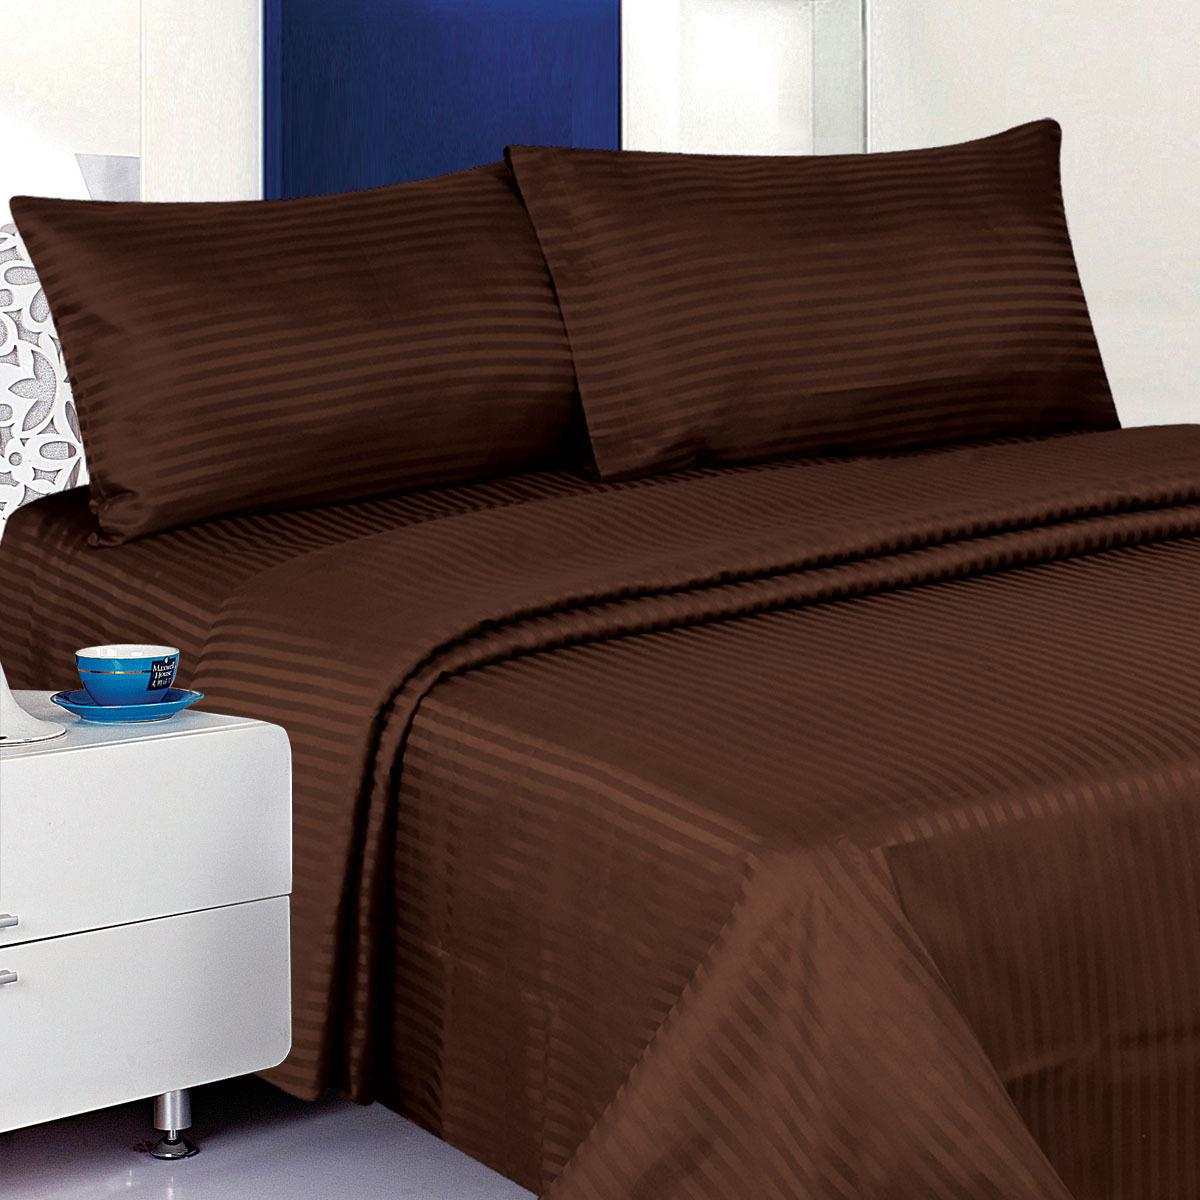 1800 Count Bed Set Twin-Full-Queen-King